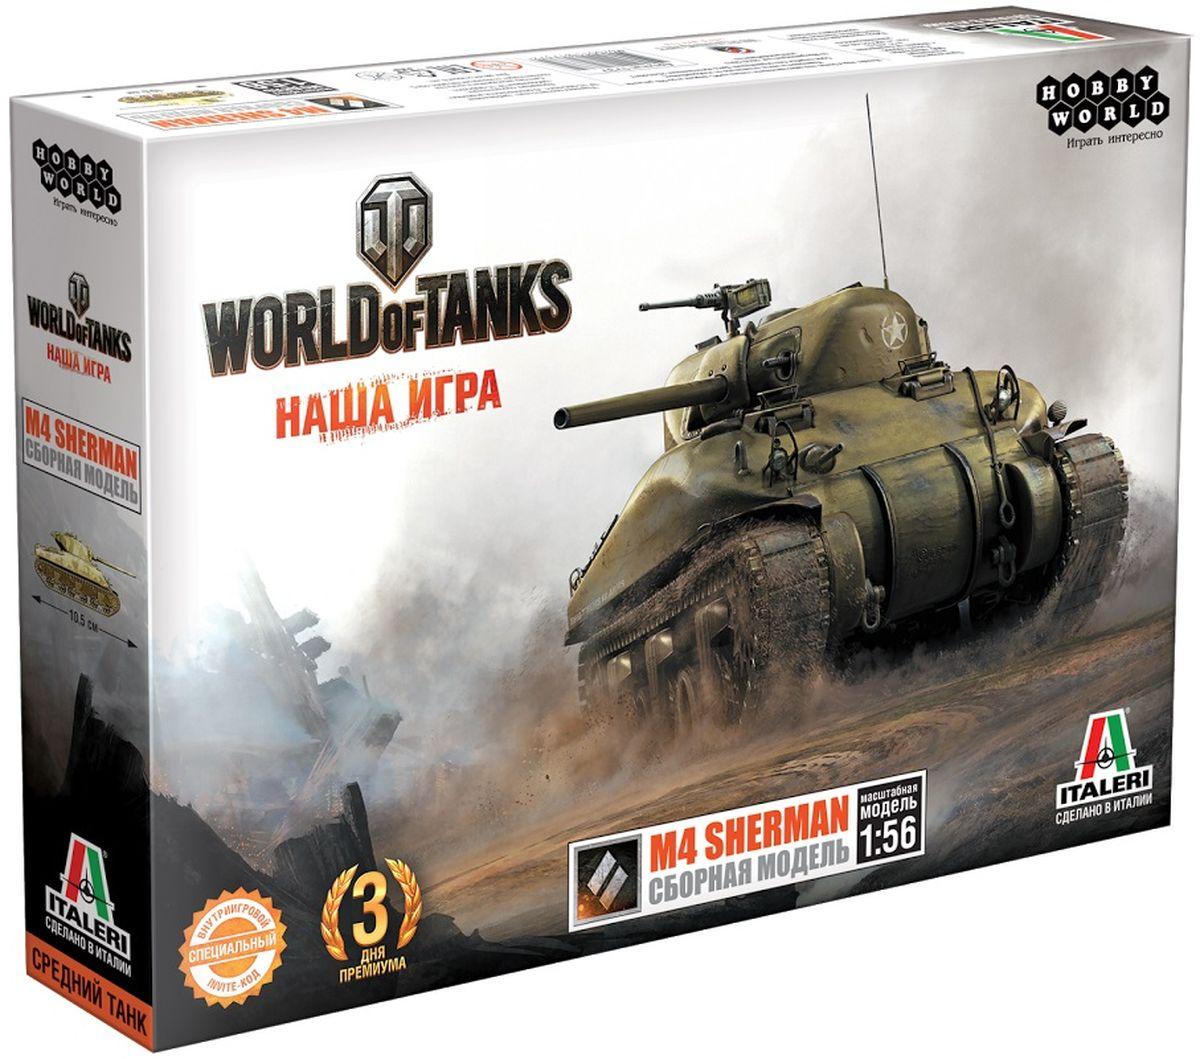 World of Tanks Сборная модель Танк M4 Sherman цены